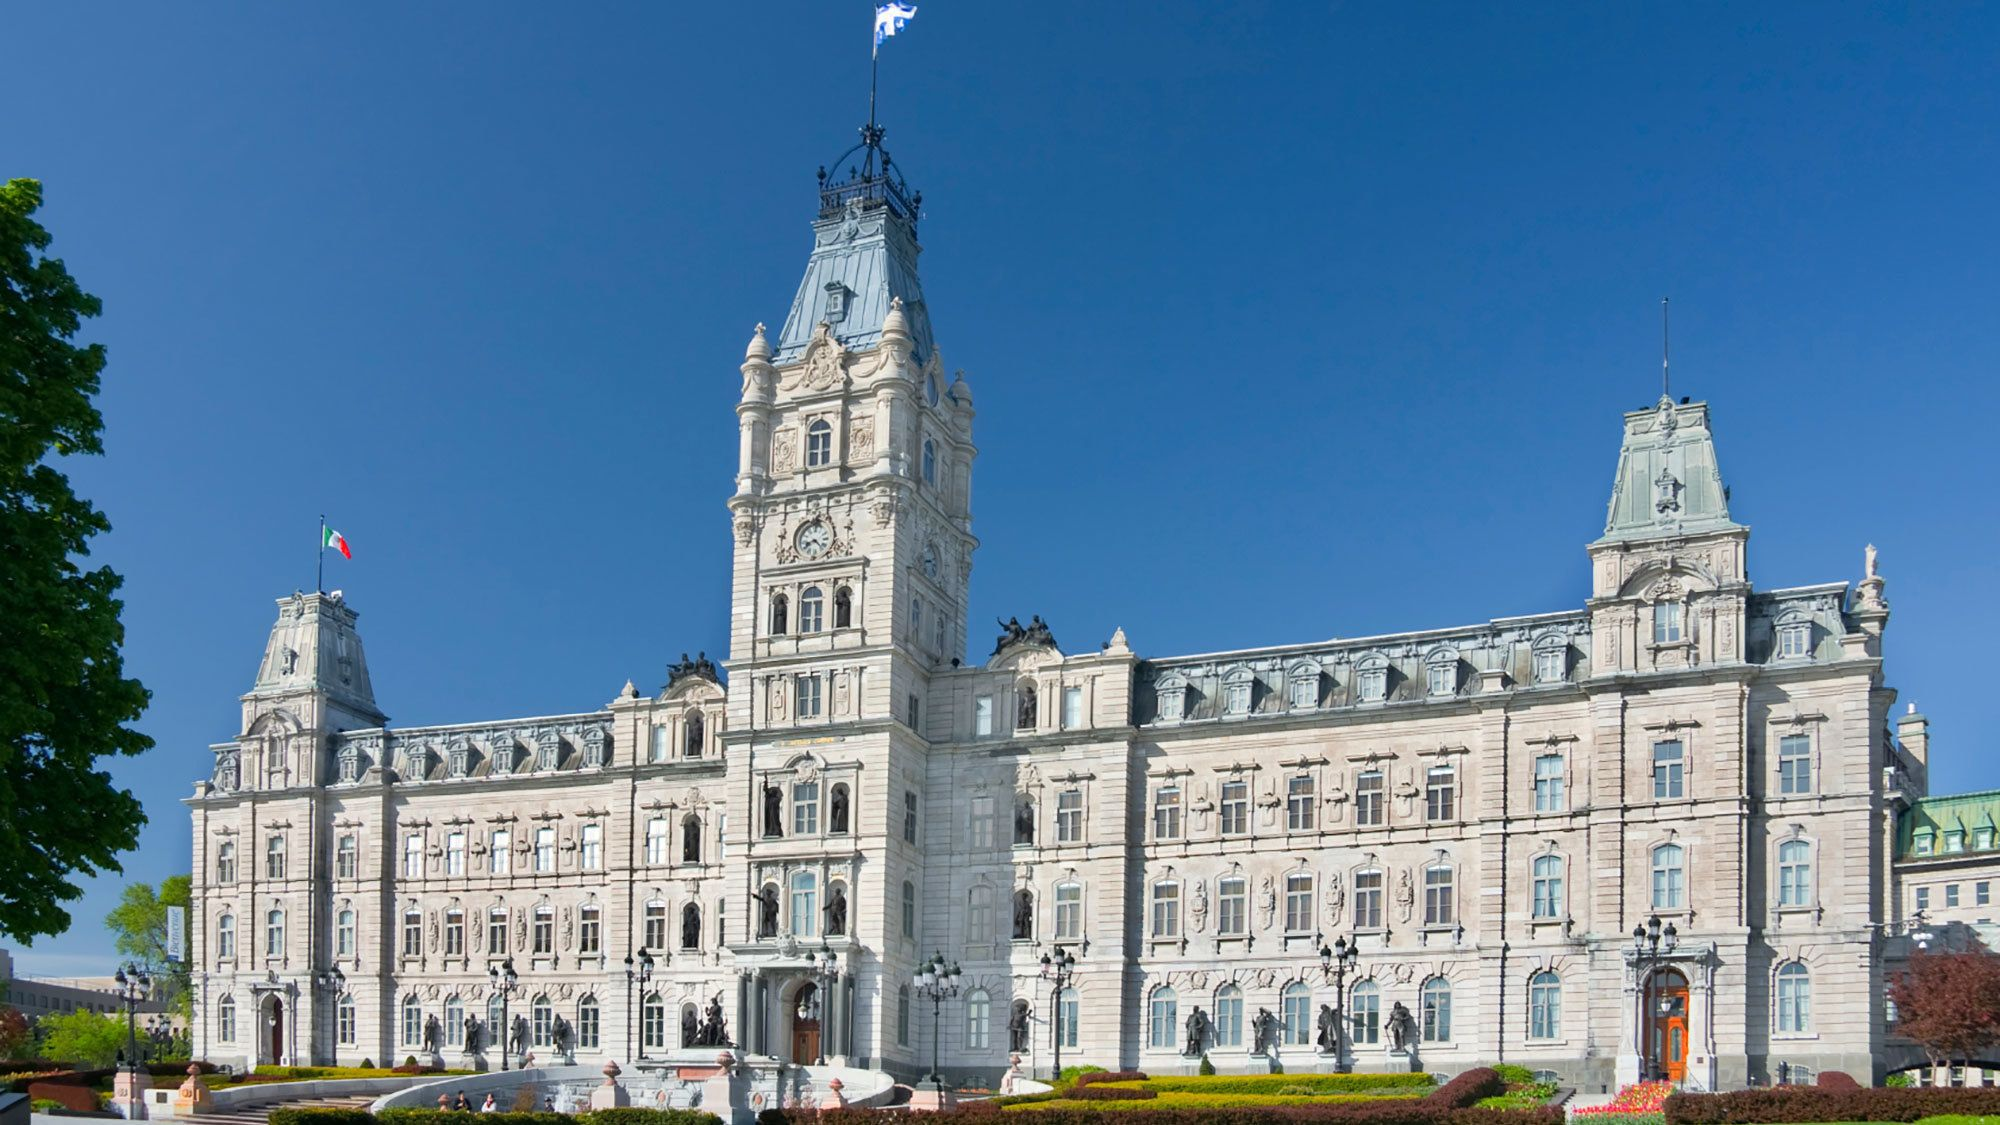 Québec Parliament and Price building